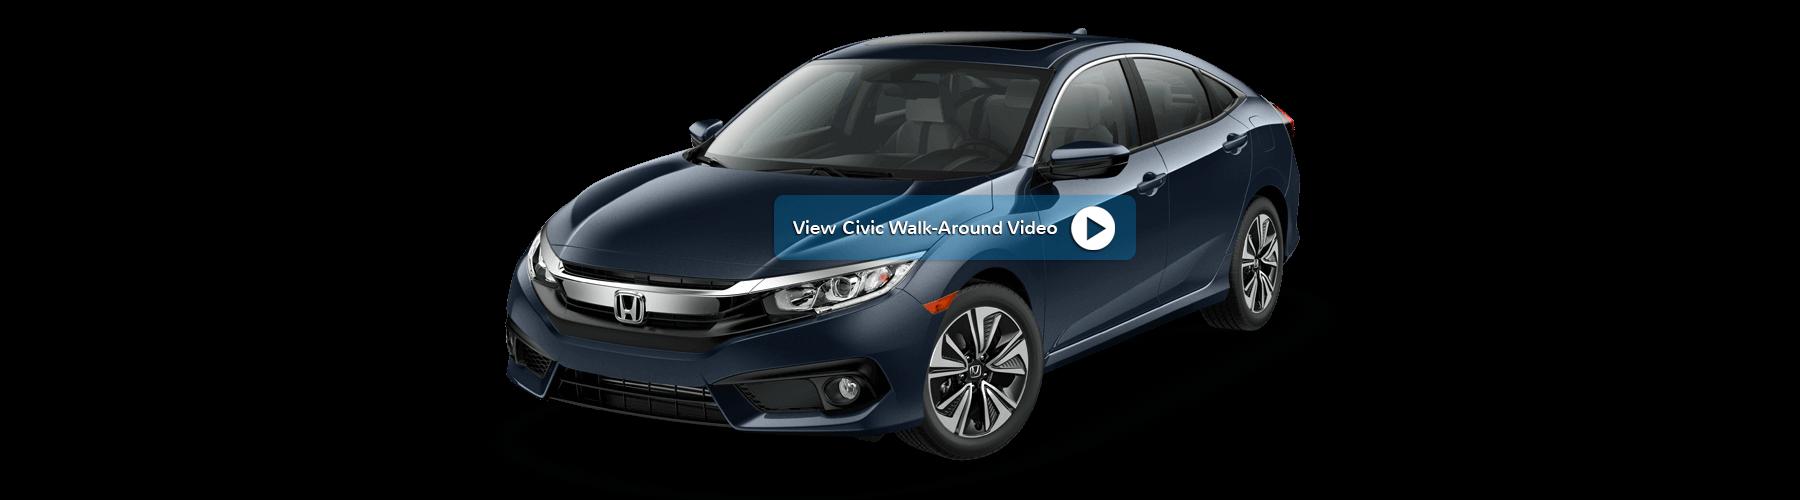 2017 Honda Civic Sedan Front Angle